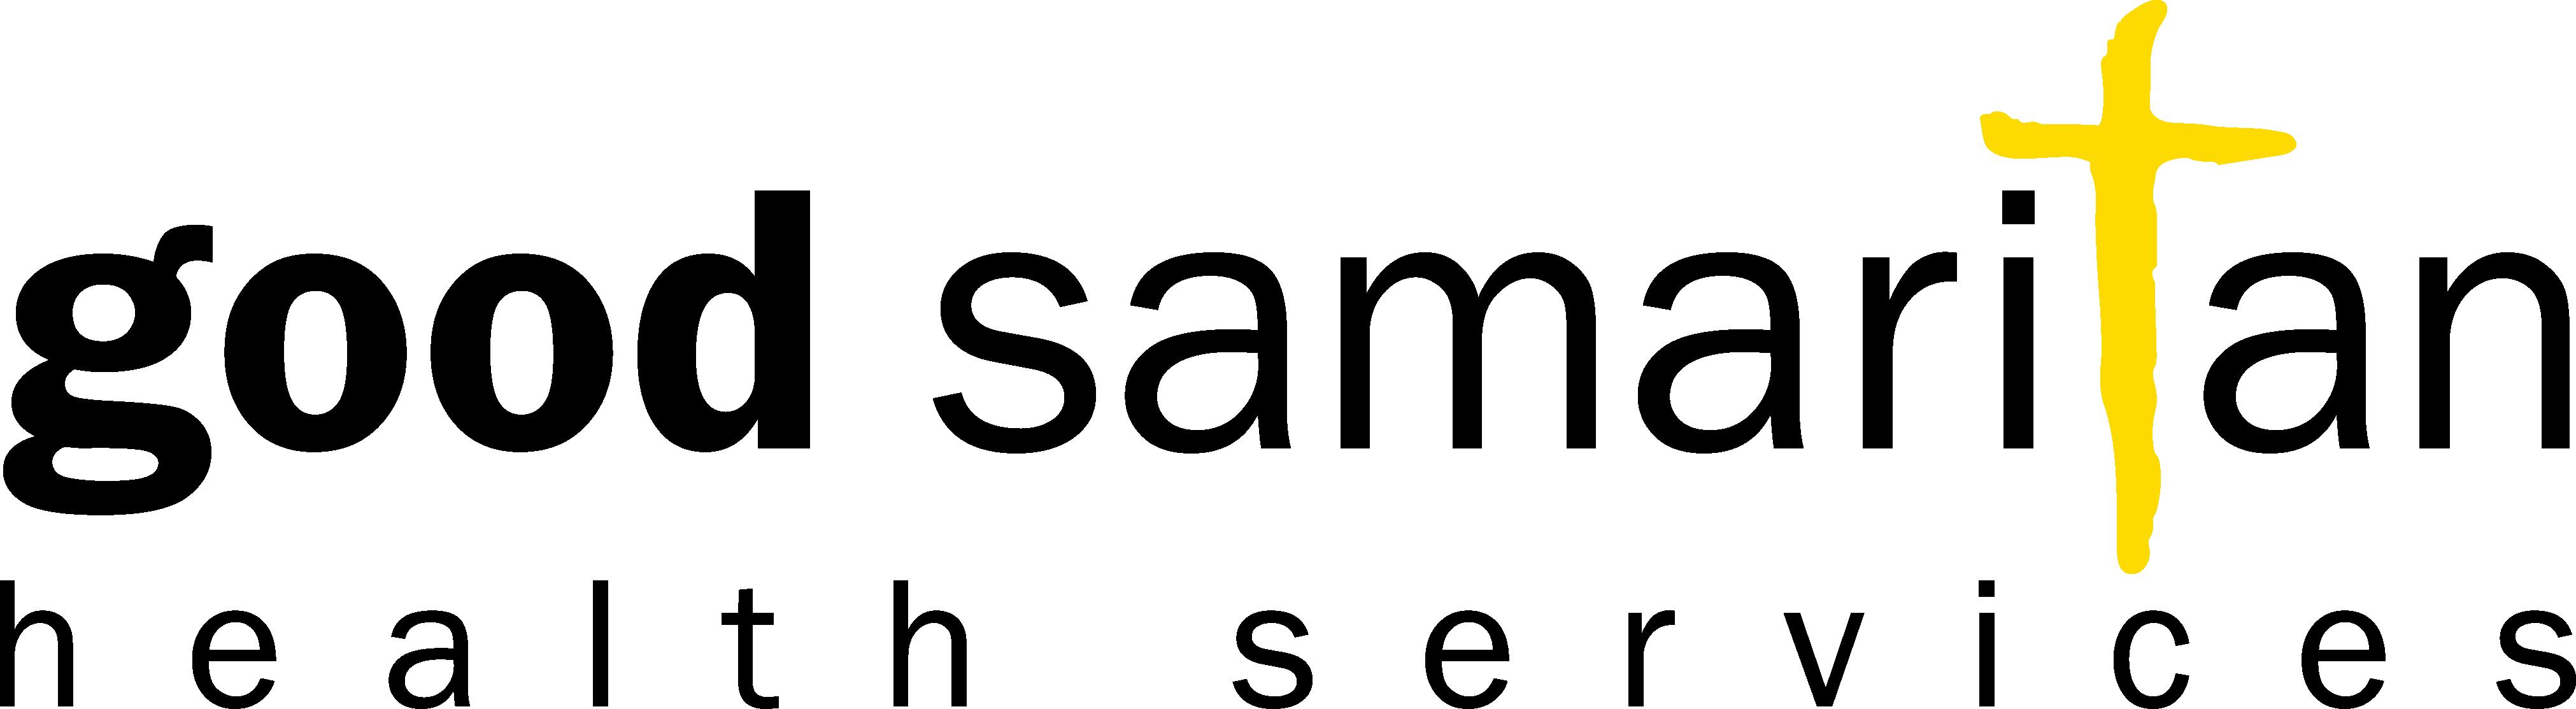 Good Samaritan Health Services Logo